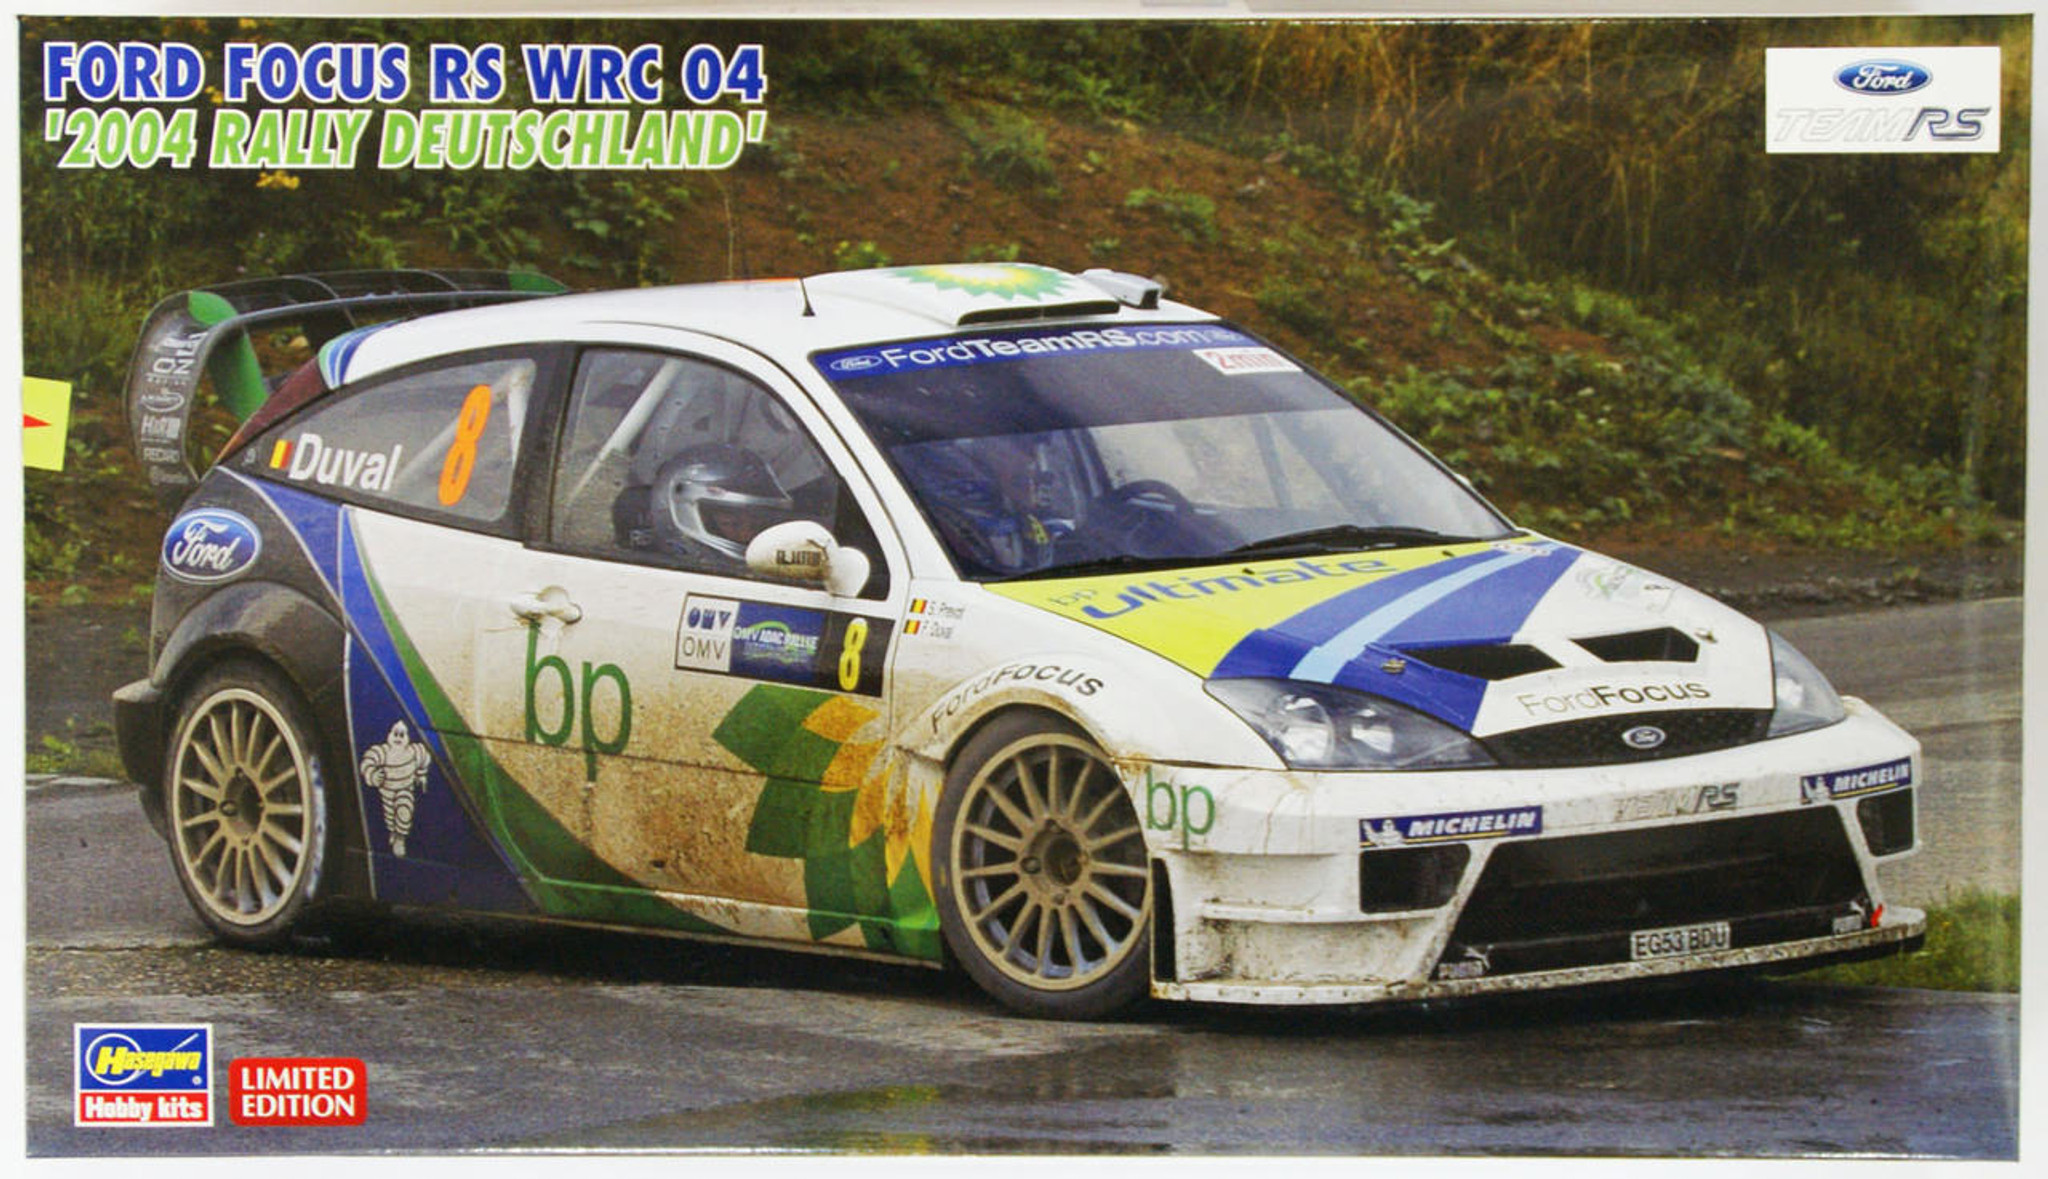 Hasegawa 20263 Ford Focus Rs Wrc 04 2004 Rally Deutschland 1 24